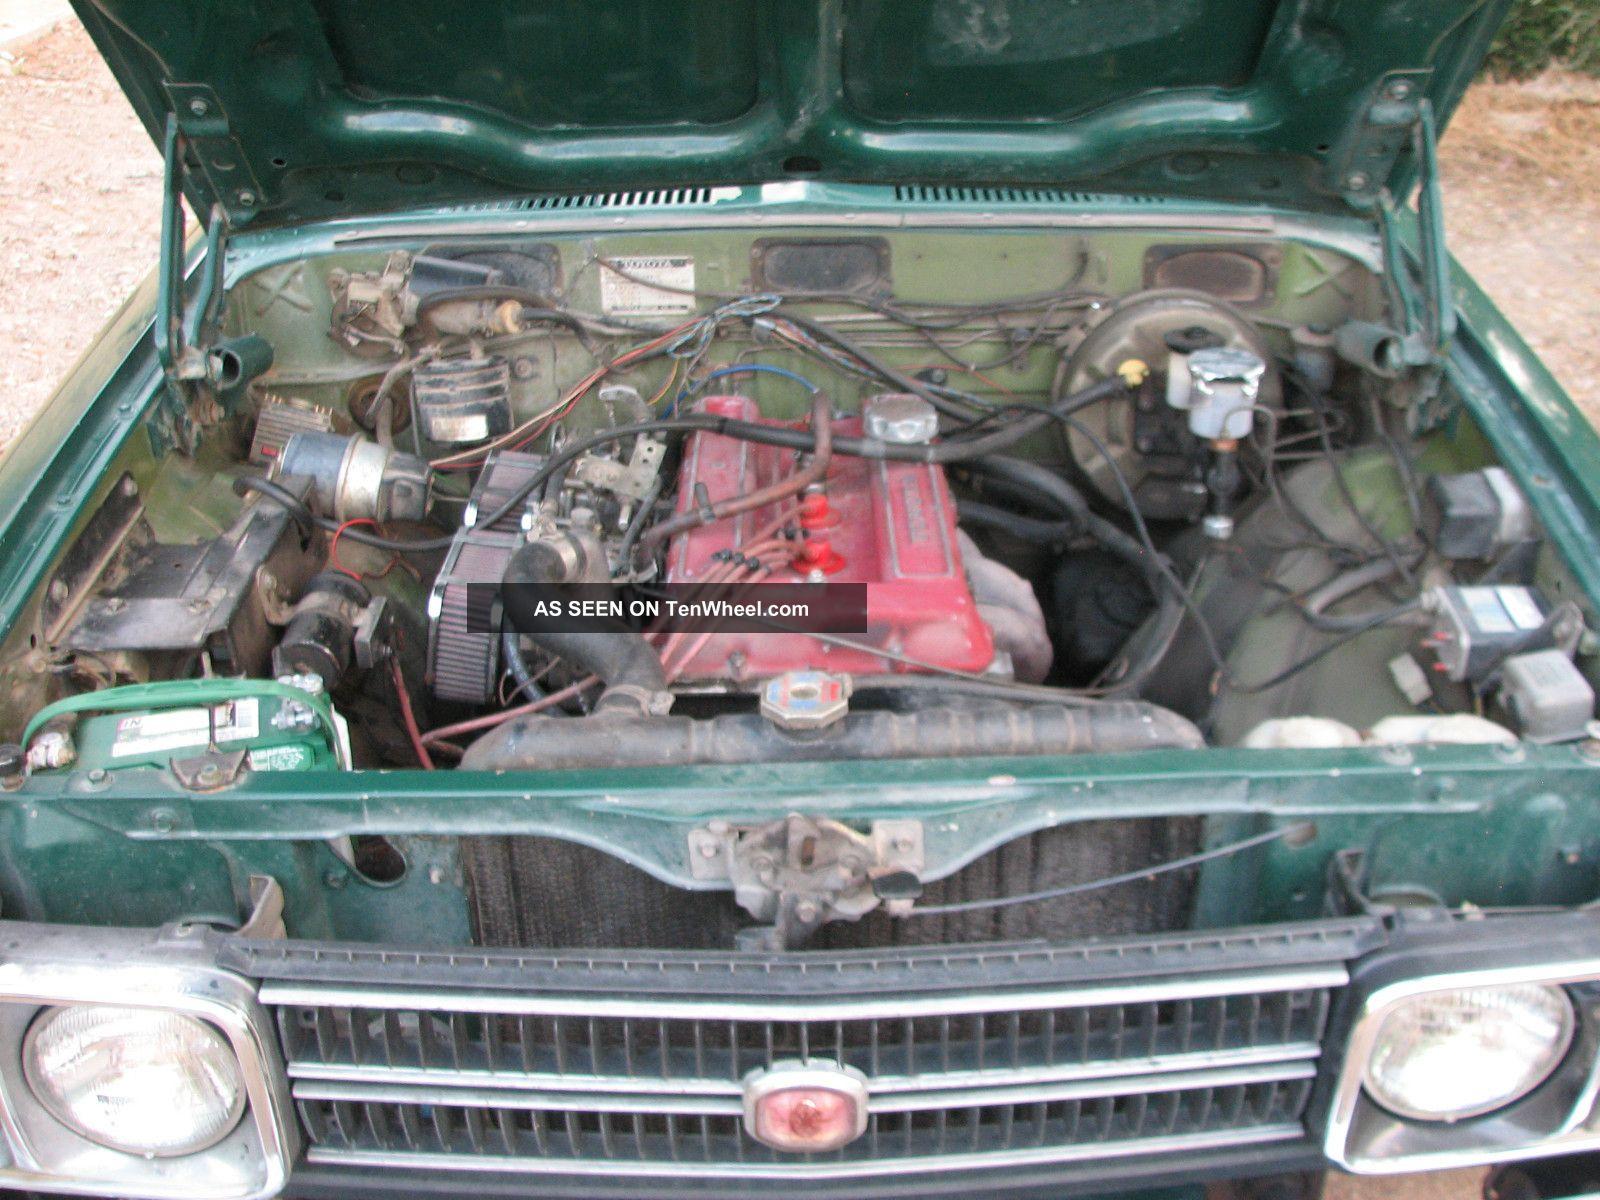 1974 Toyota Corona Unique Oem / High Performance 18rg Engine